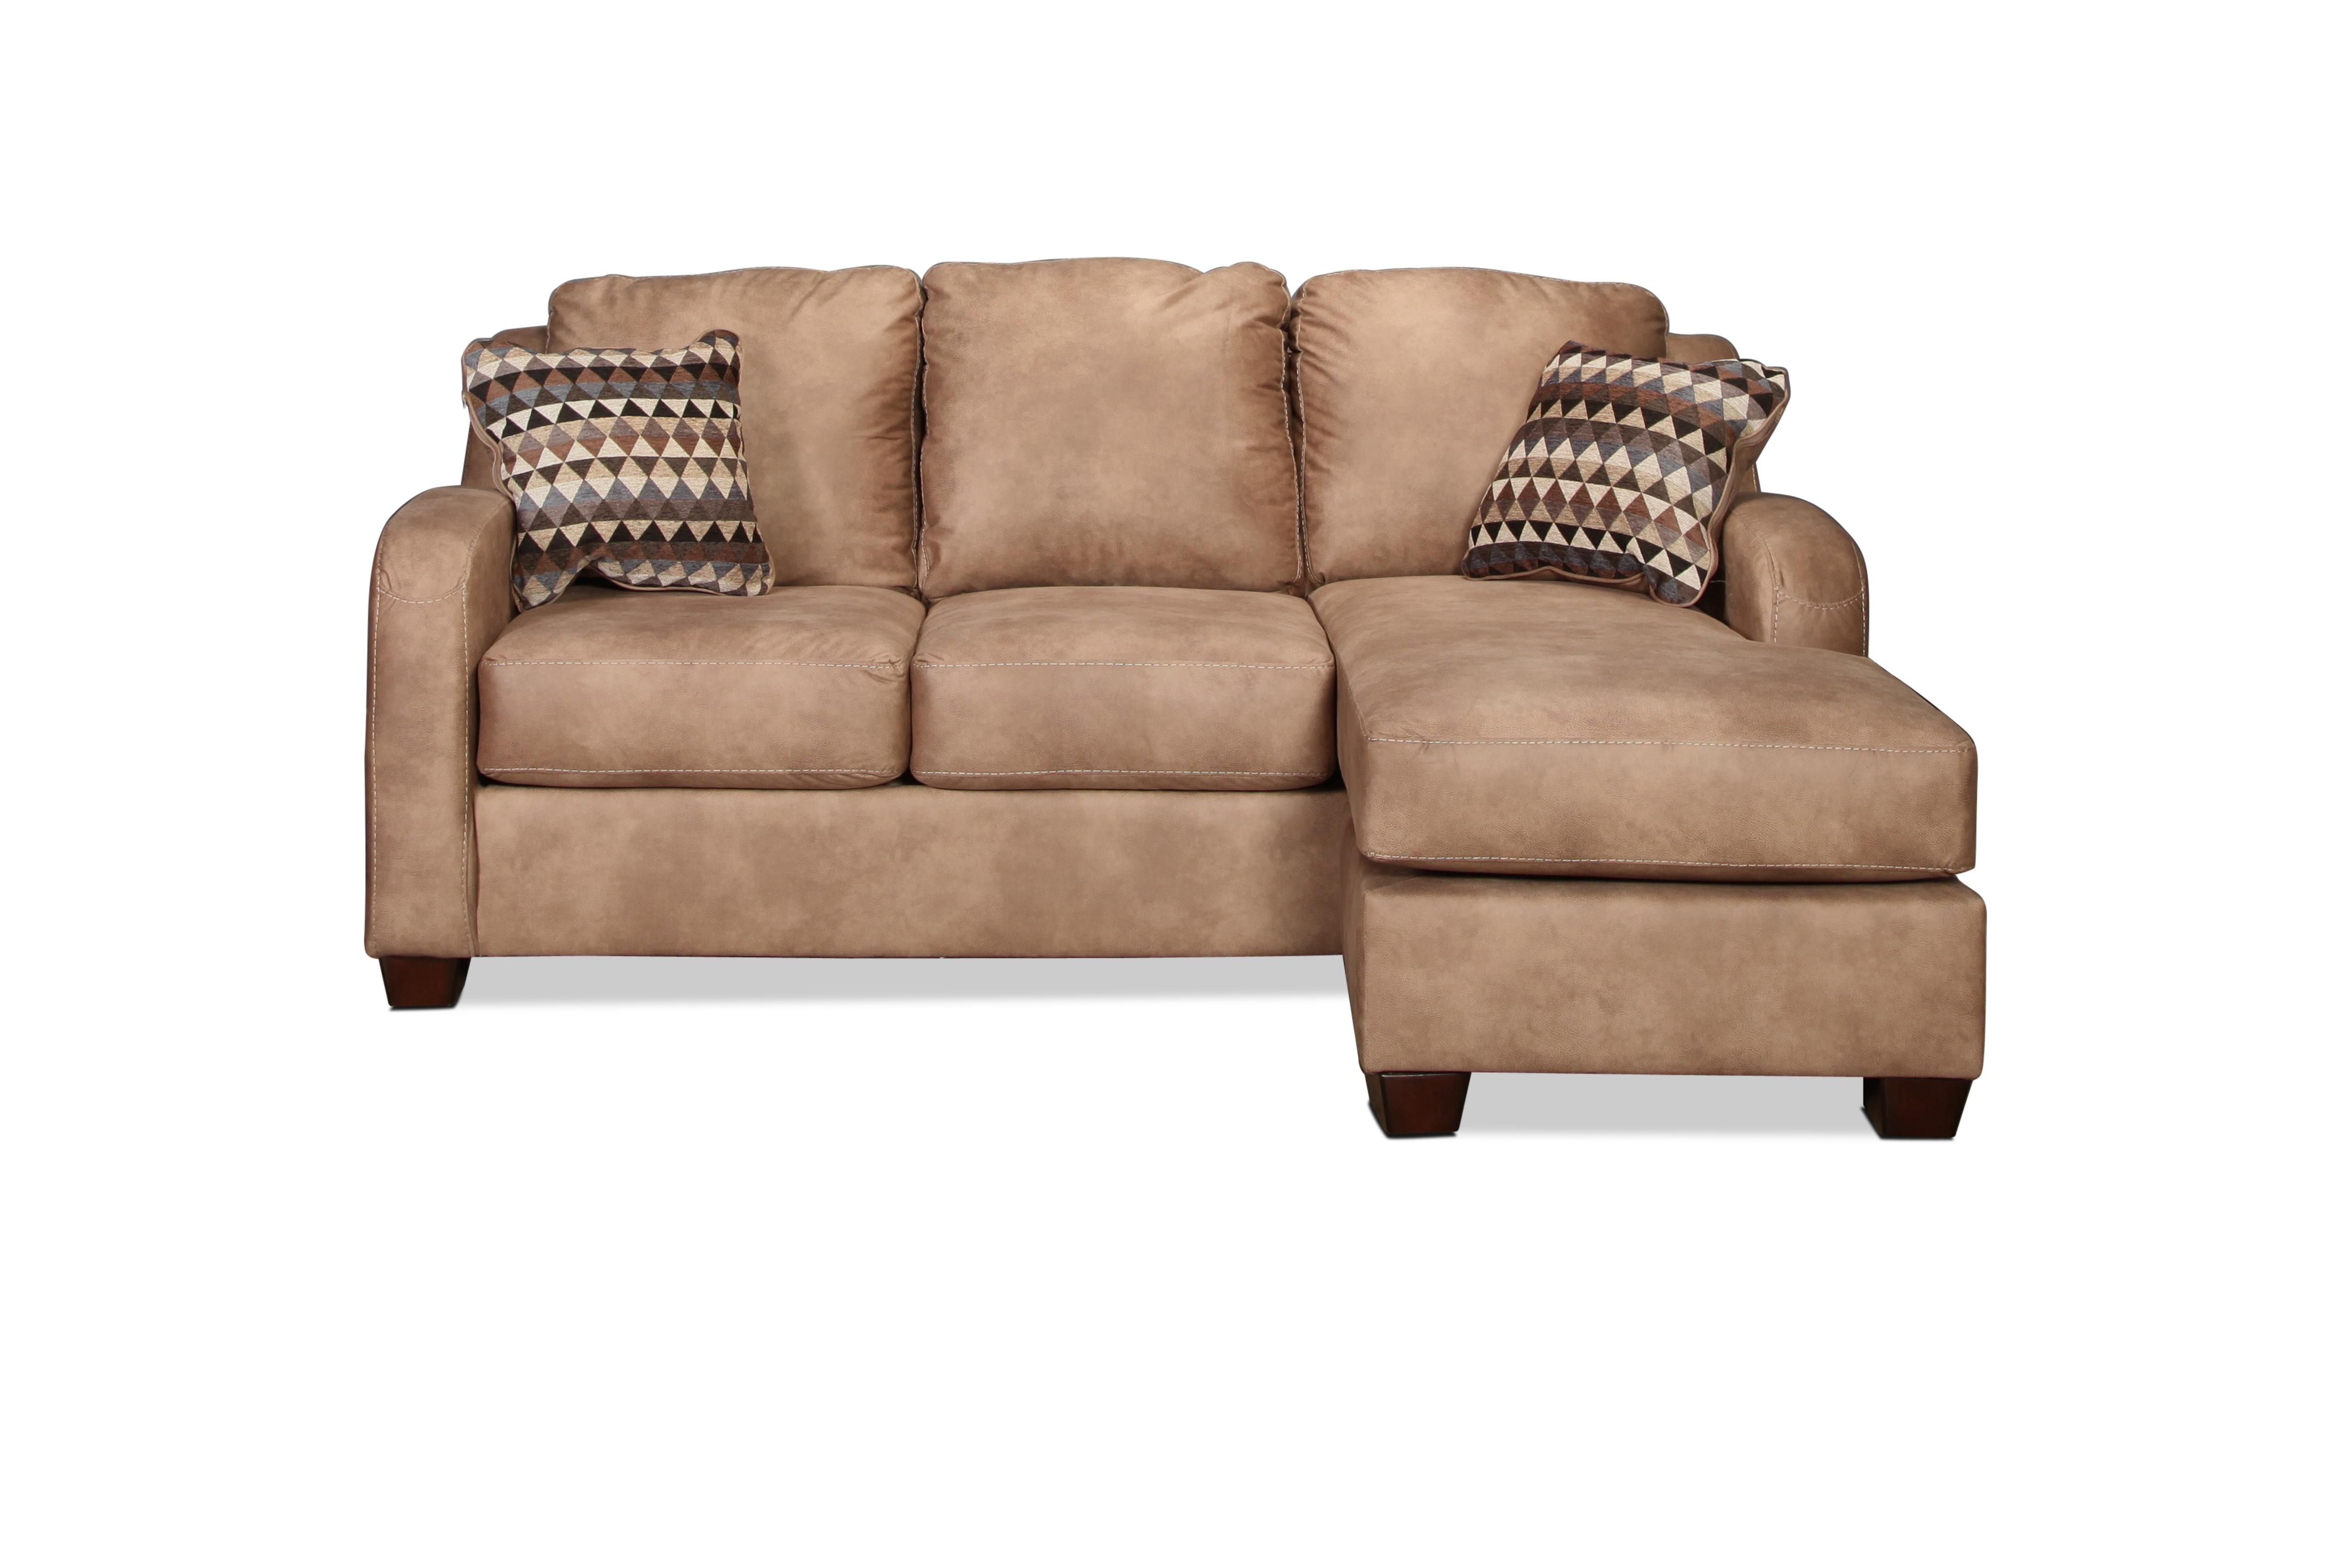 Living Room Furniture - Fresno Chaise Sofa - Dune